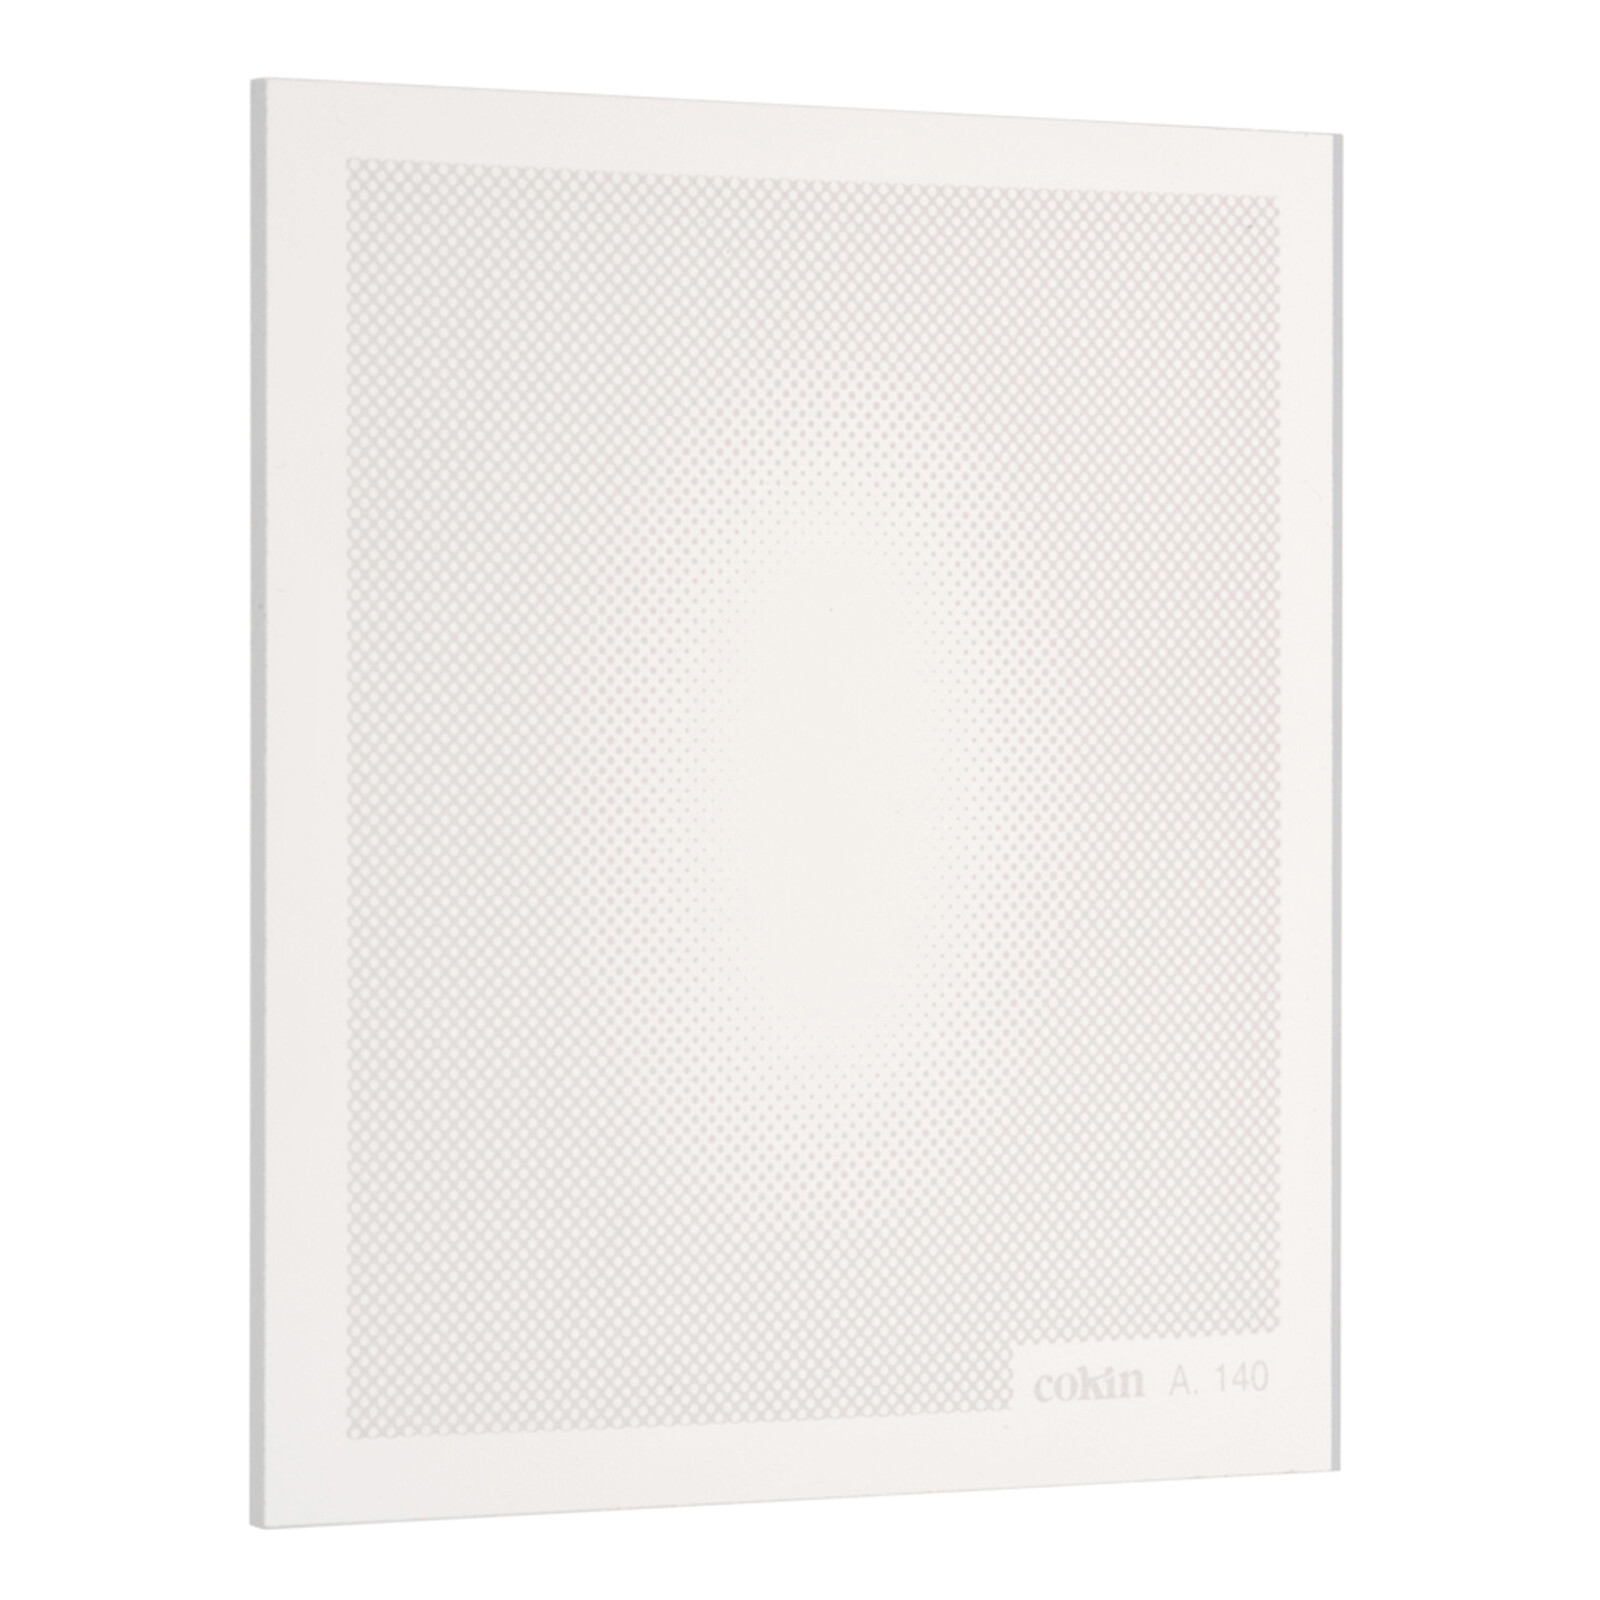 Cokin A140 Center Spot White